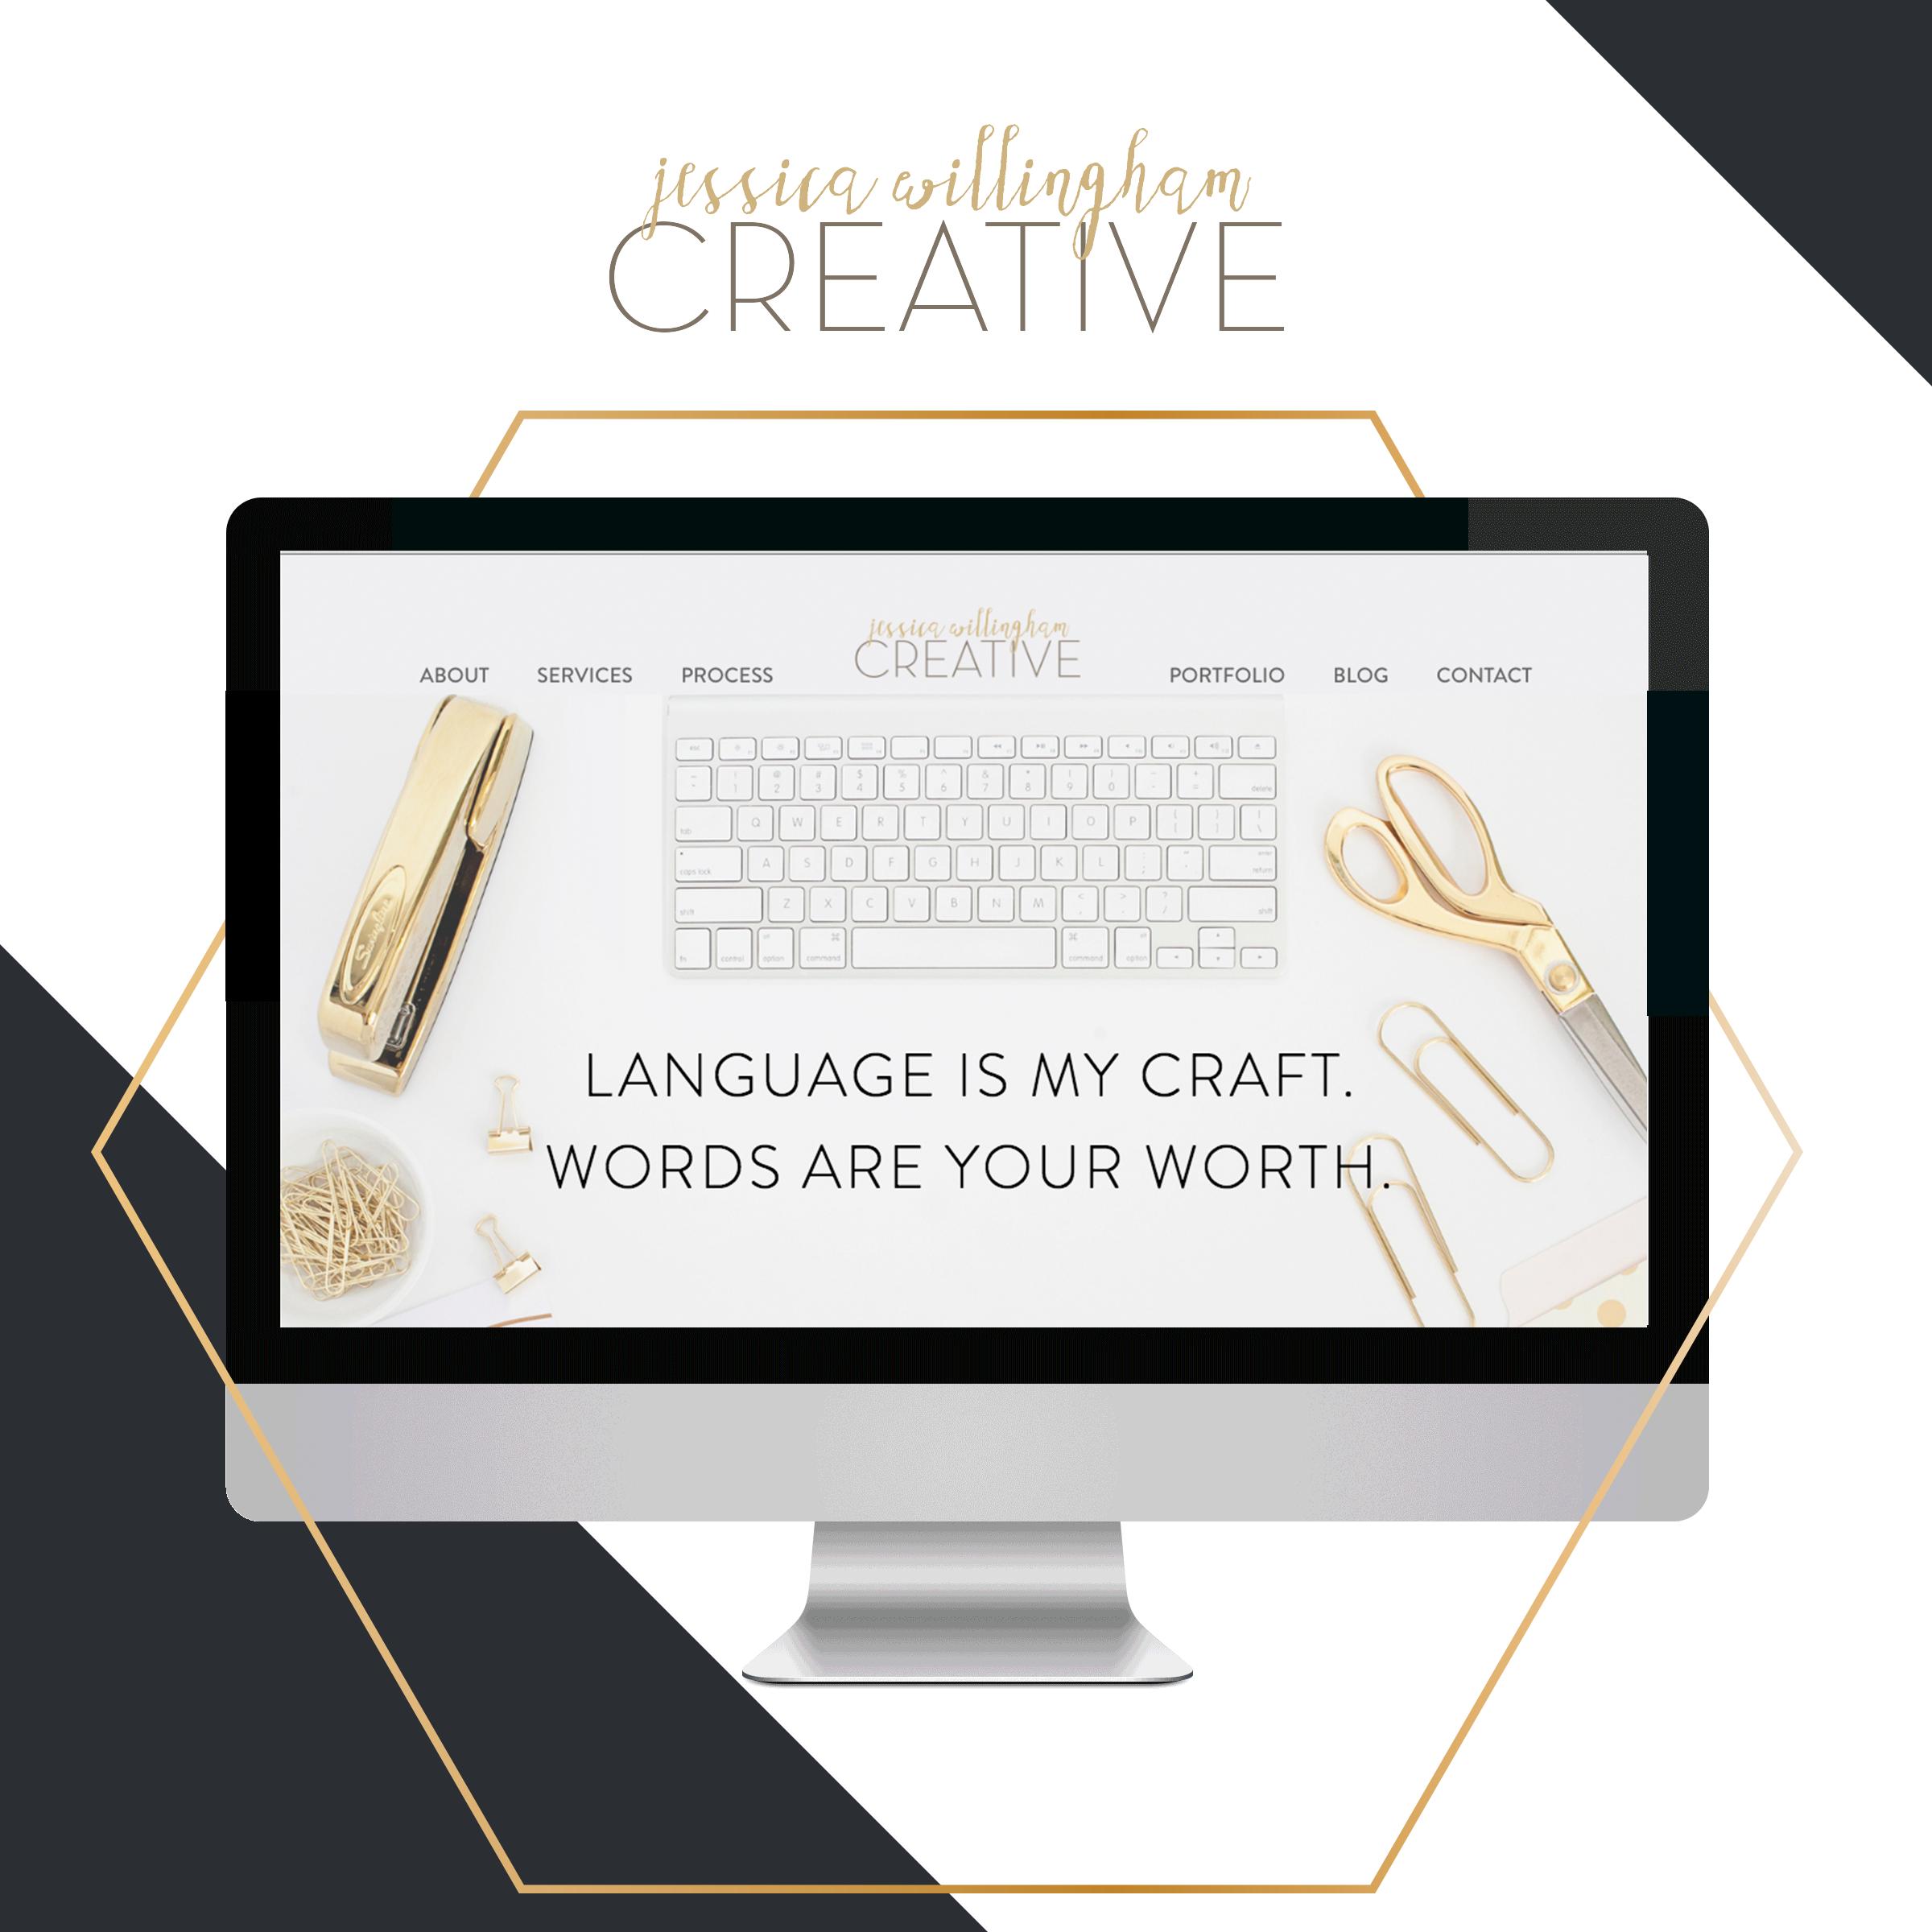 jessica-willingham-creative-writing-web-design-june-mango.png